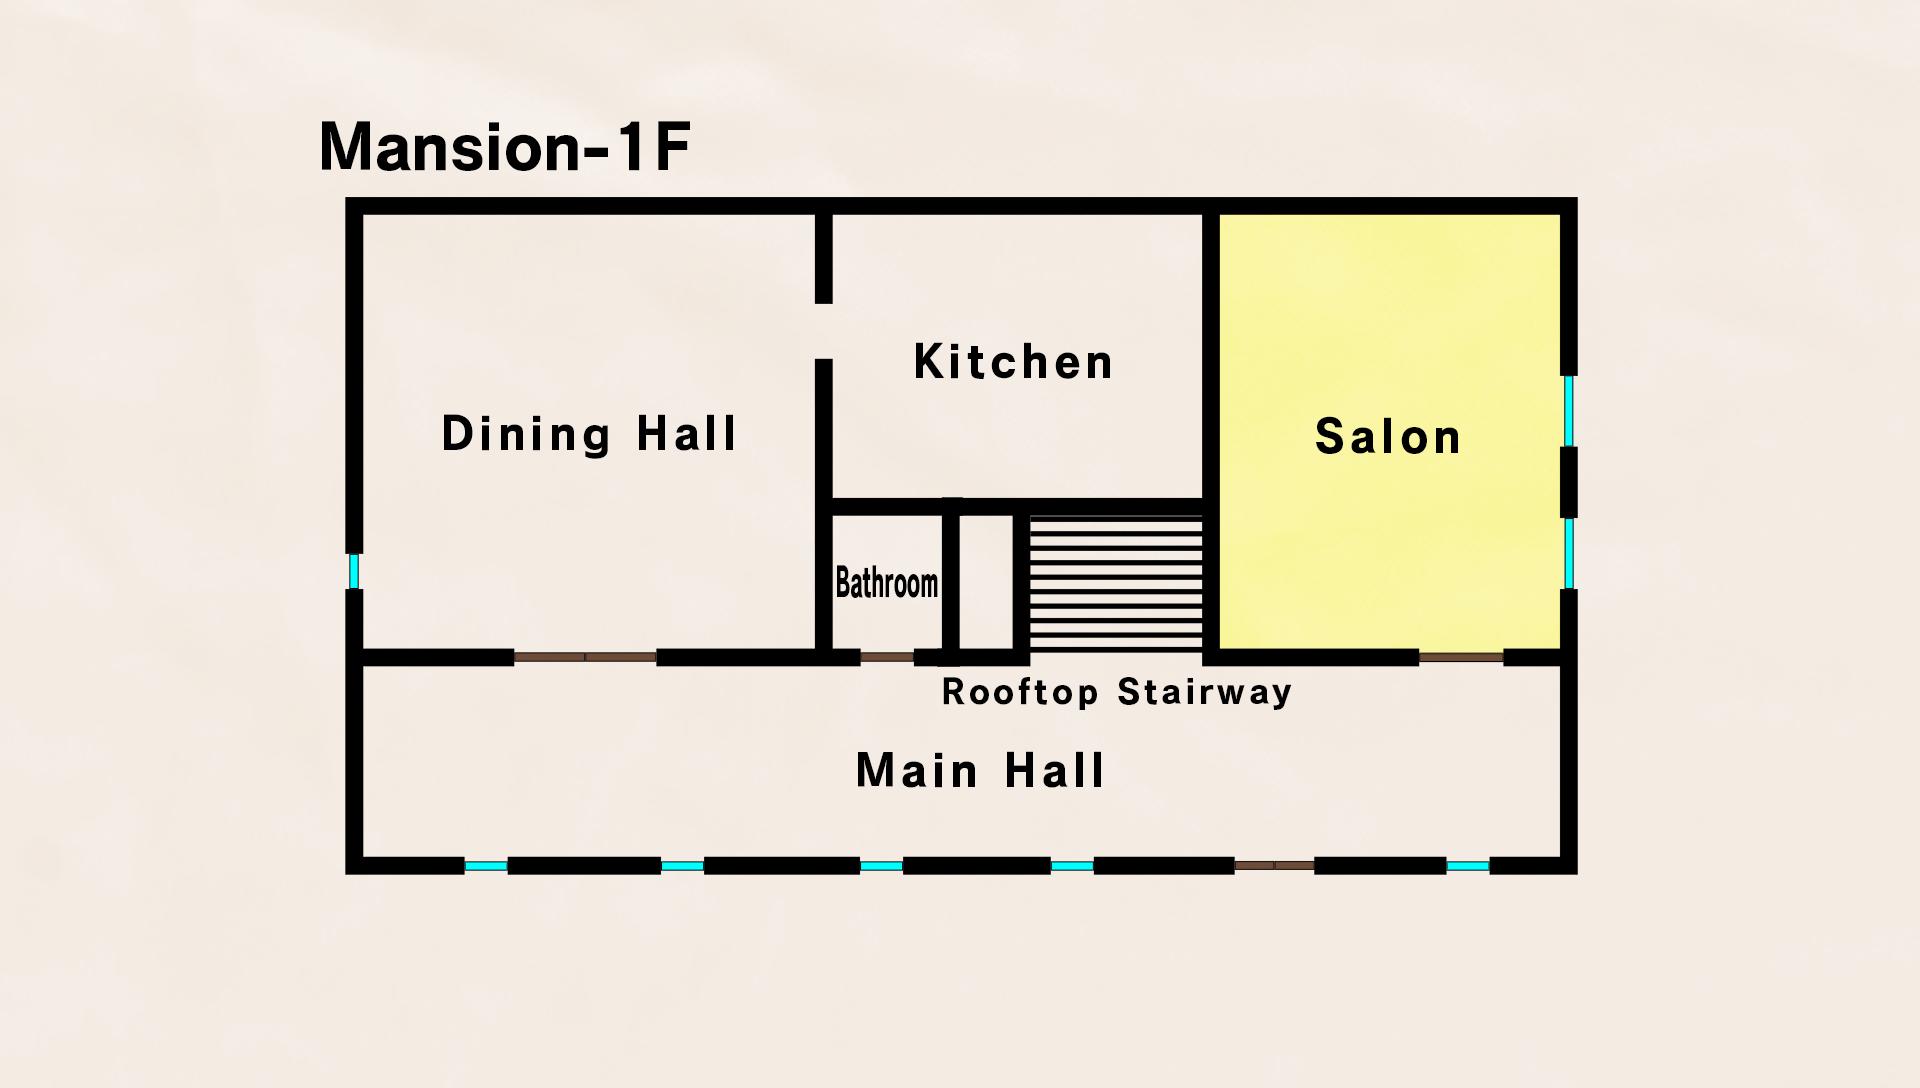 danganronpa v3 cg neo world program mansion map englishpng